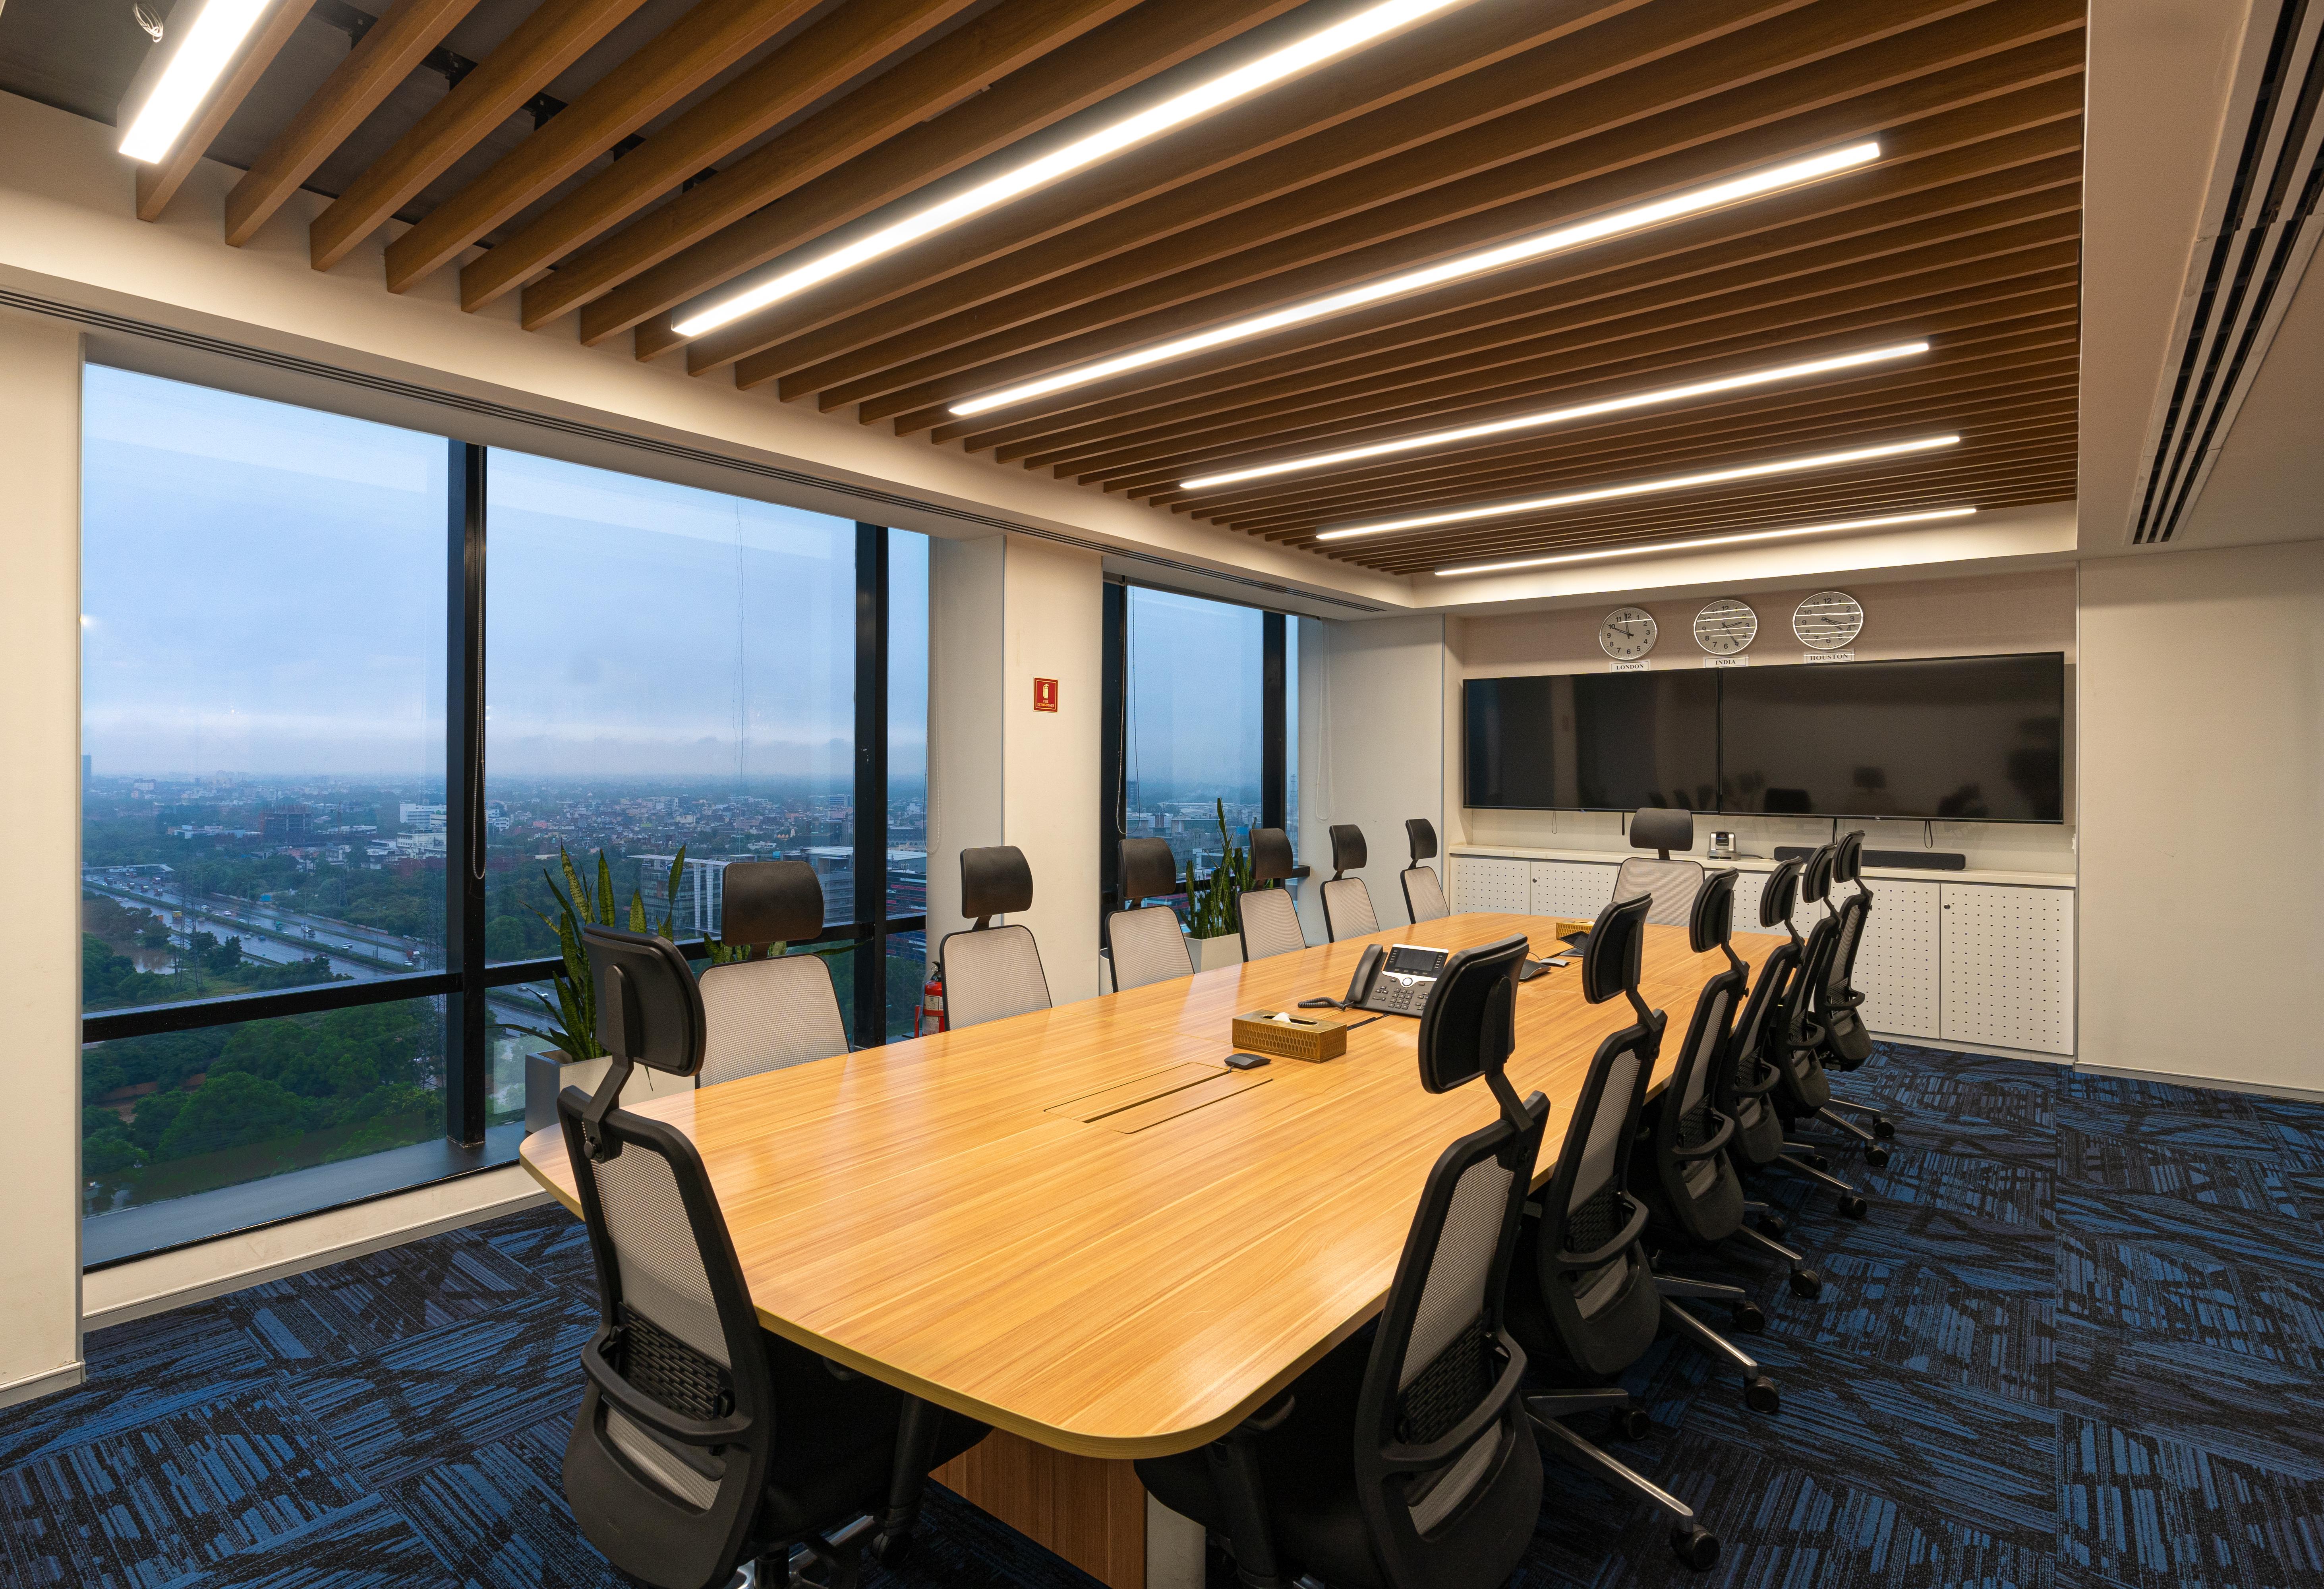 DLF Square Meeting Room